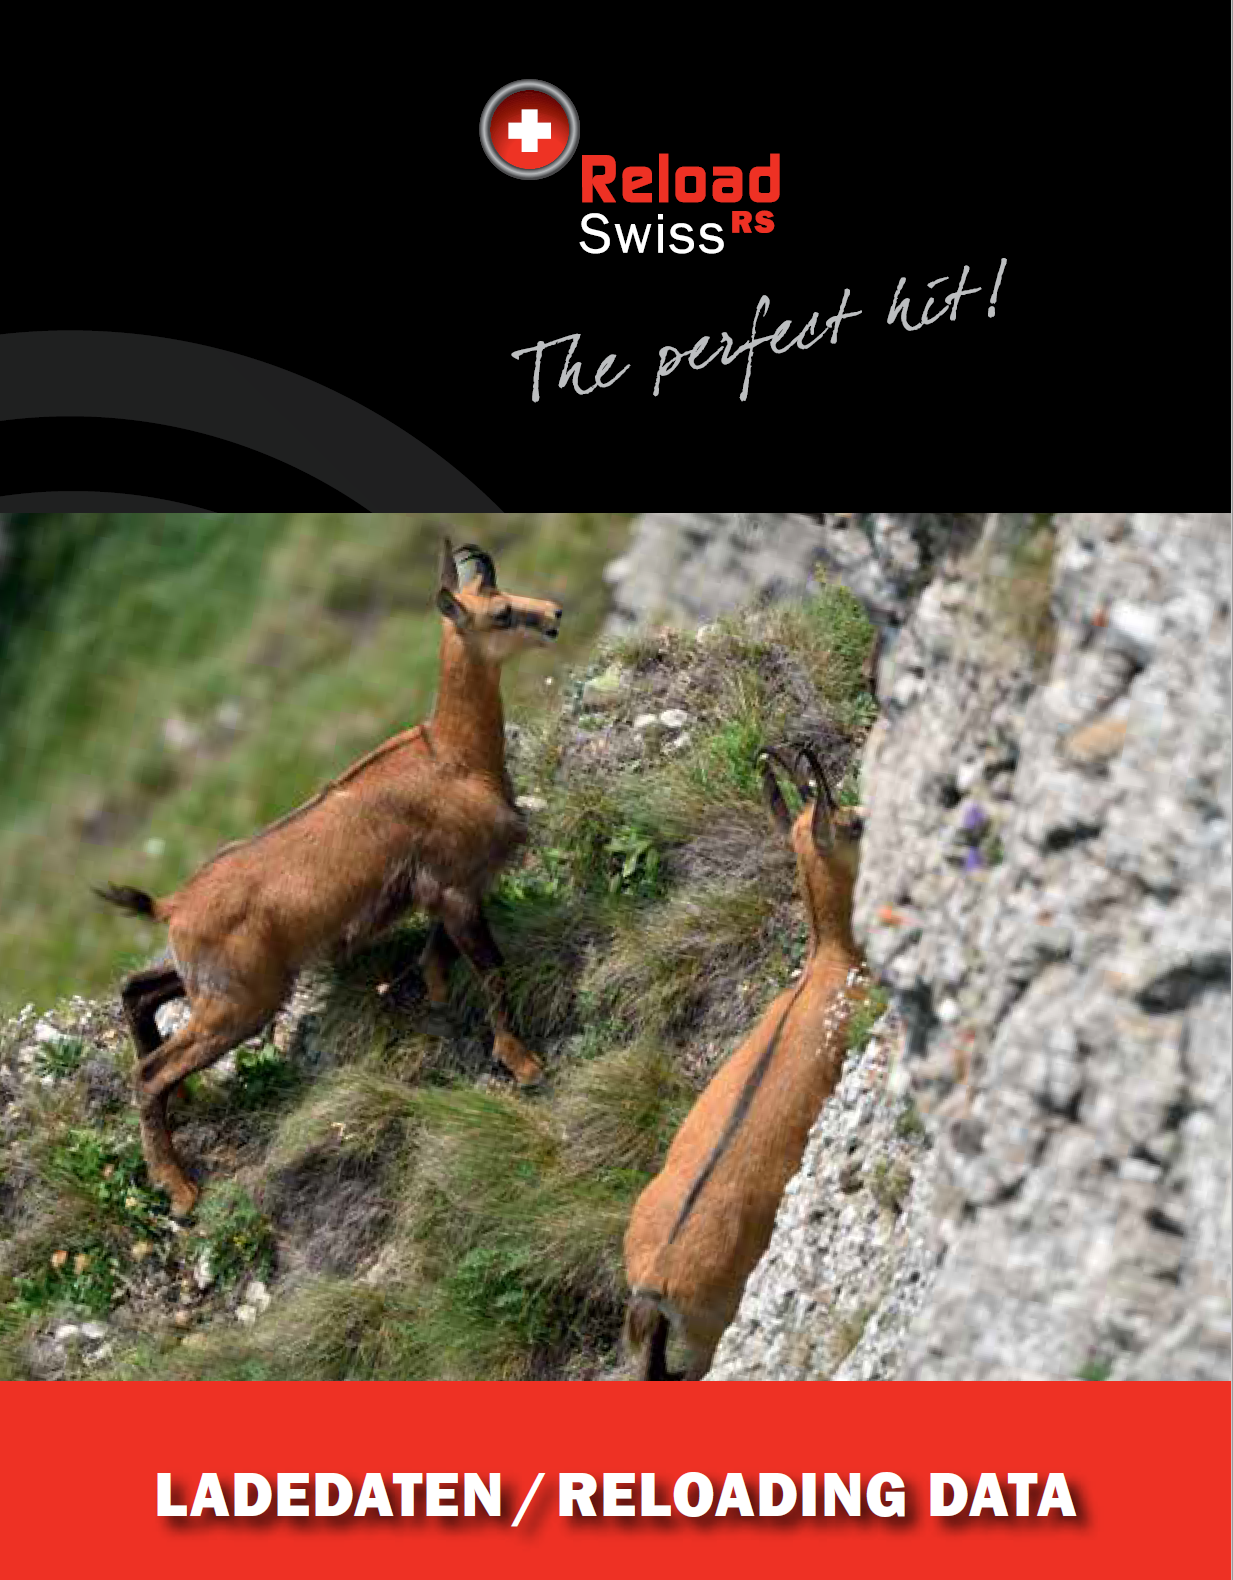 Reload Swiss Reloading Guide 2017